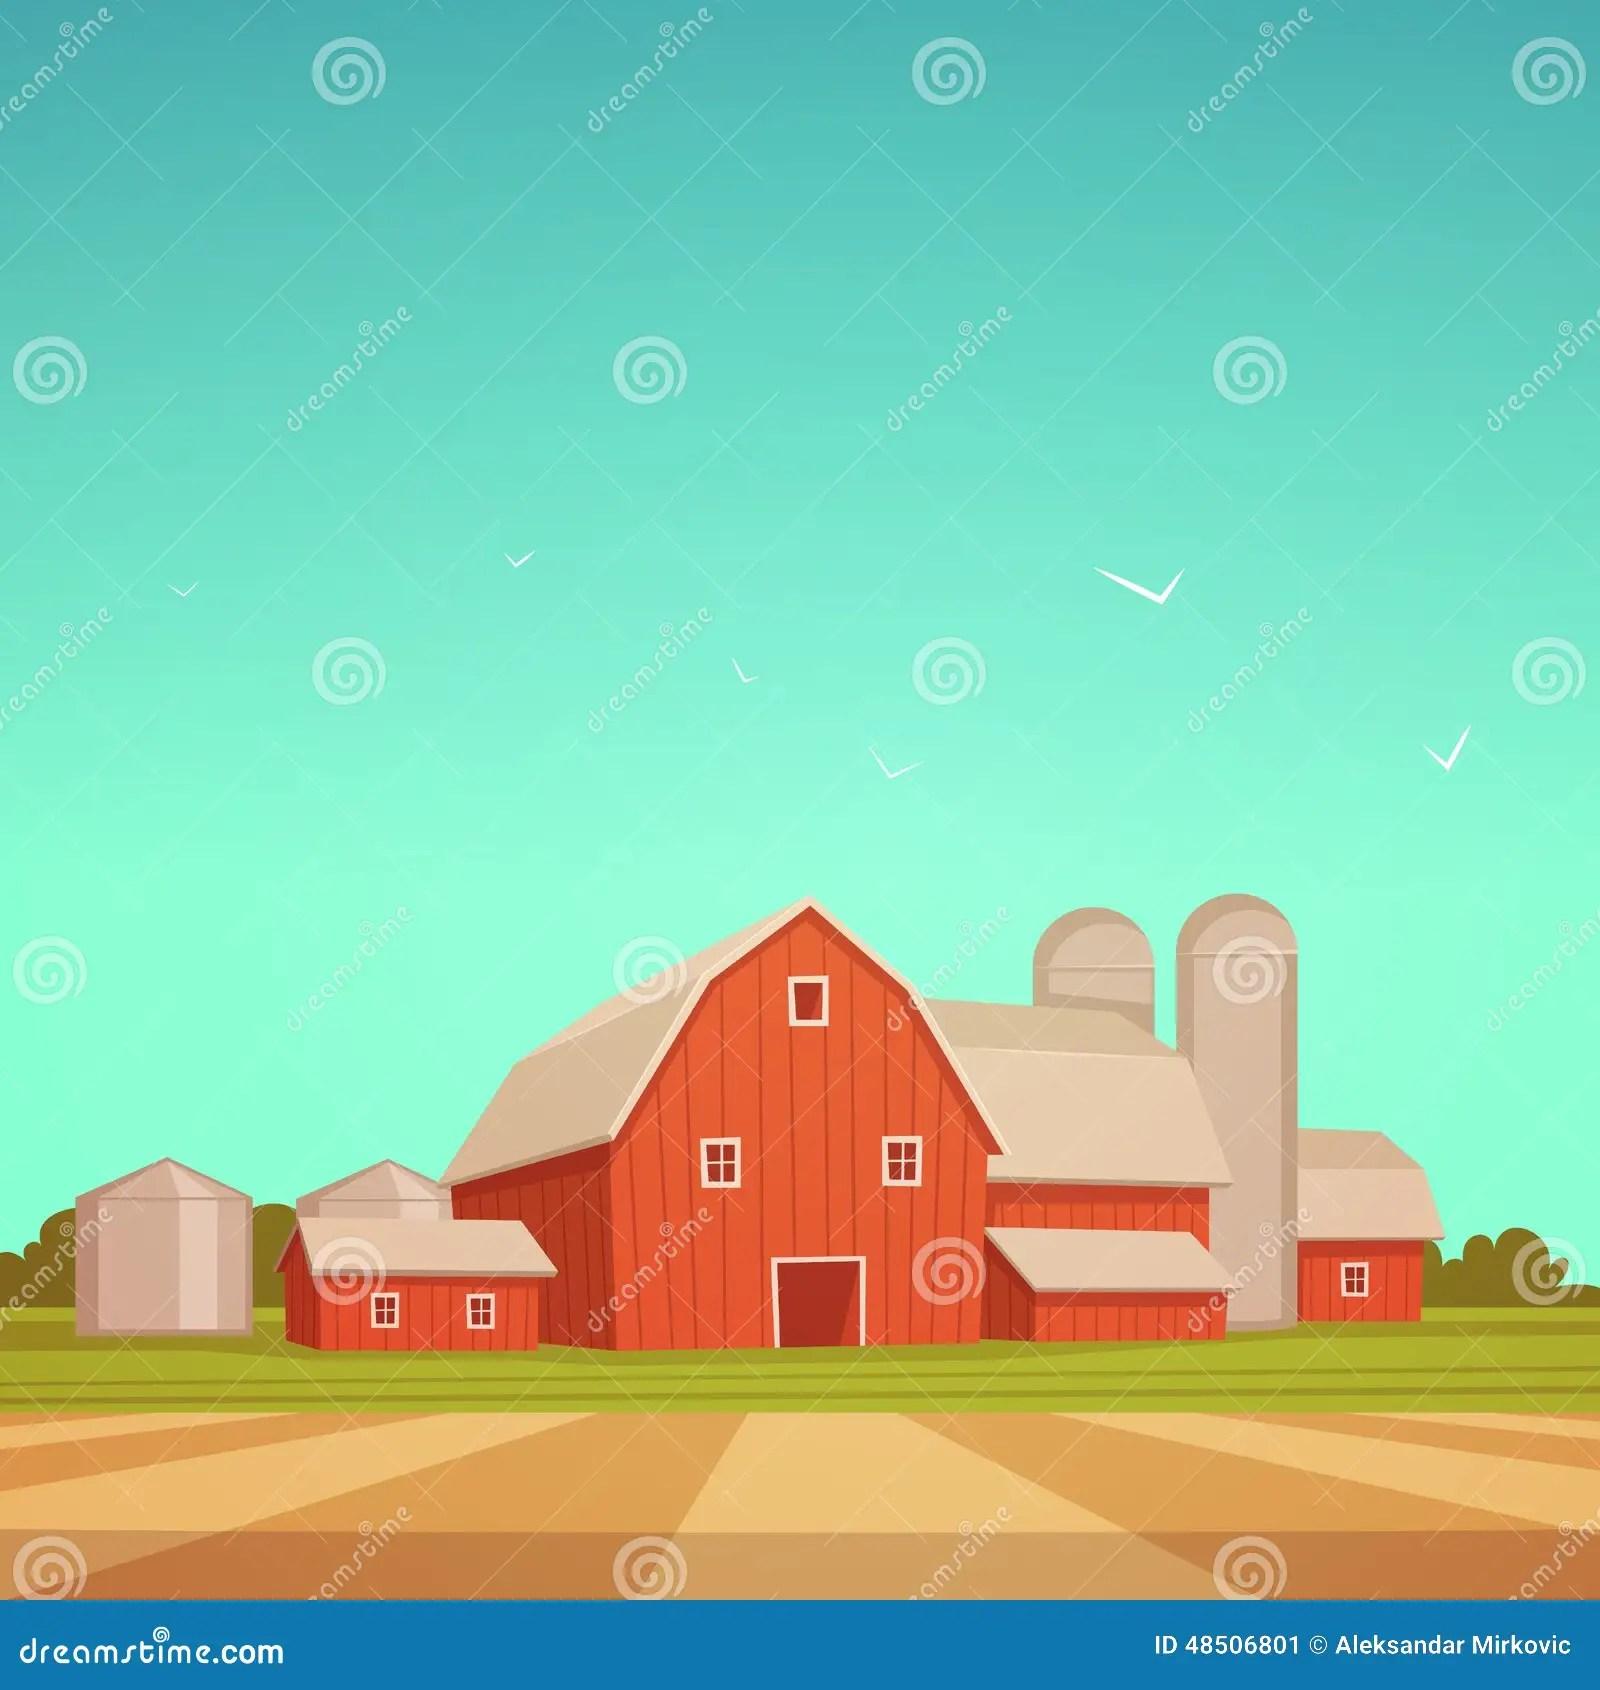 Red Farm Barn Stock Vector Illustration Of Background